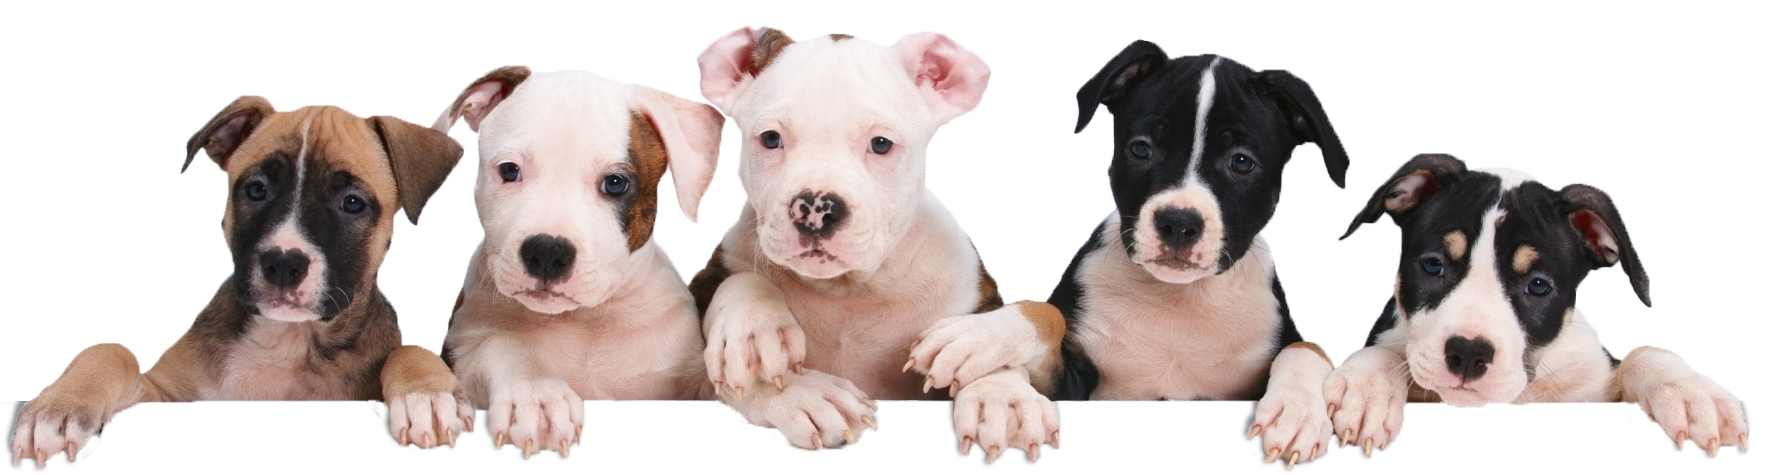 Petland Dog For Sale